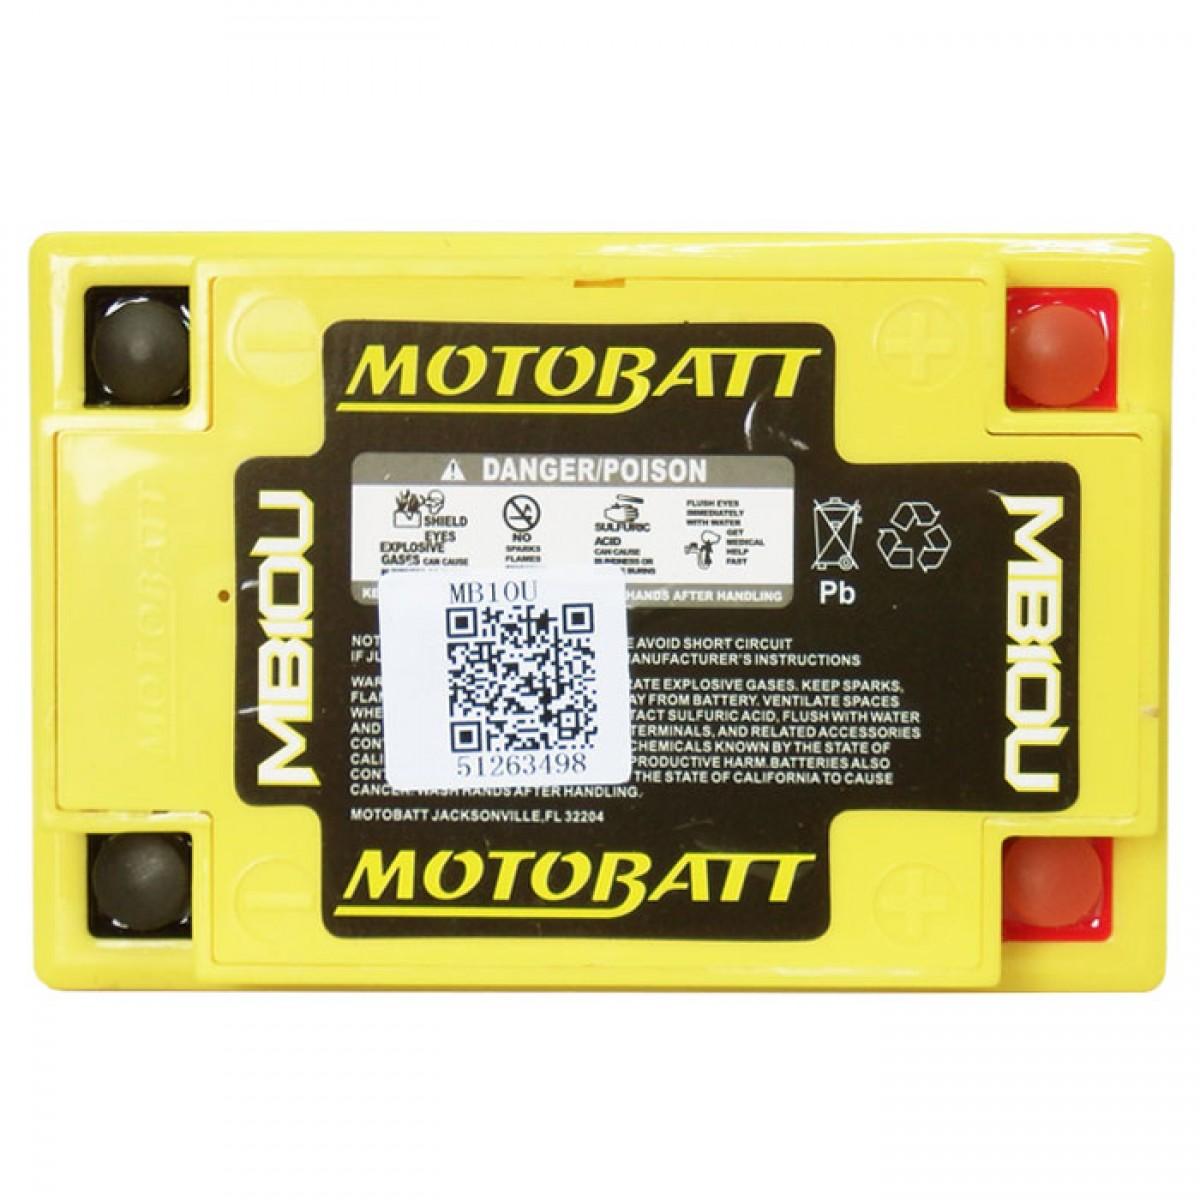 bateria MB10U motobatt